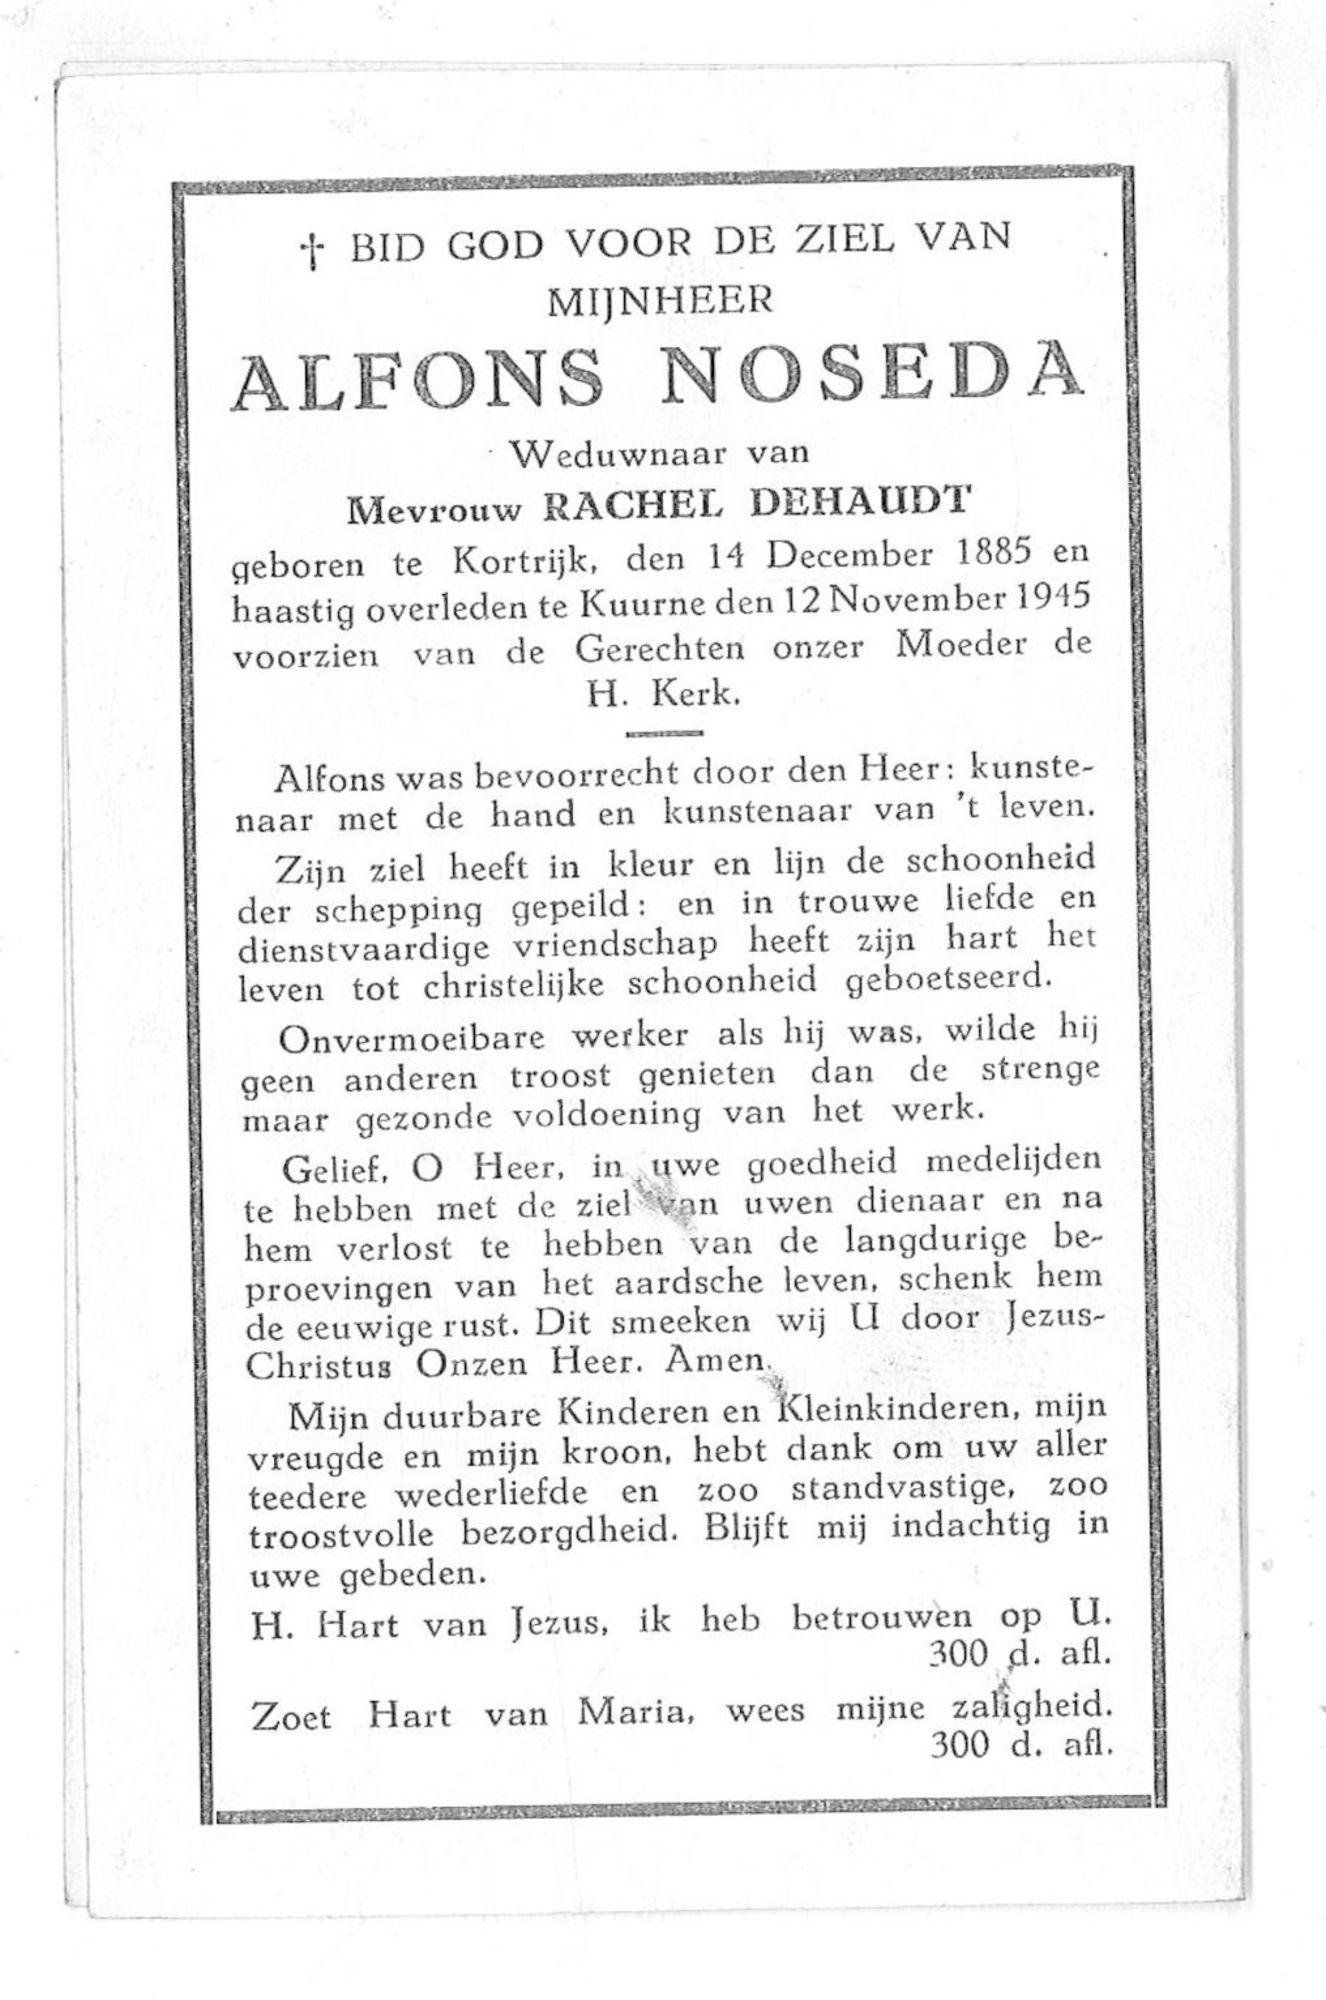 Alfons Noseda